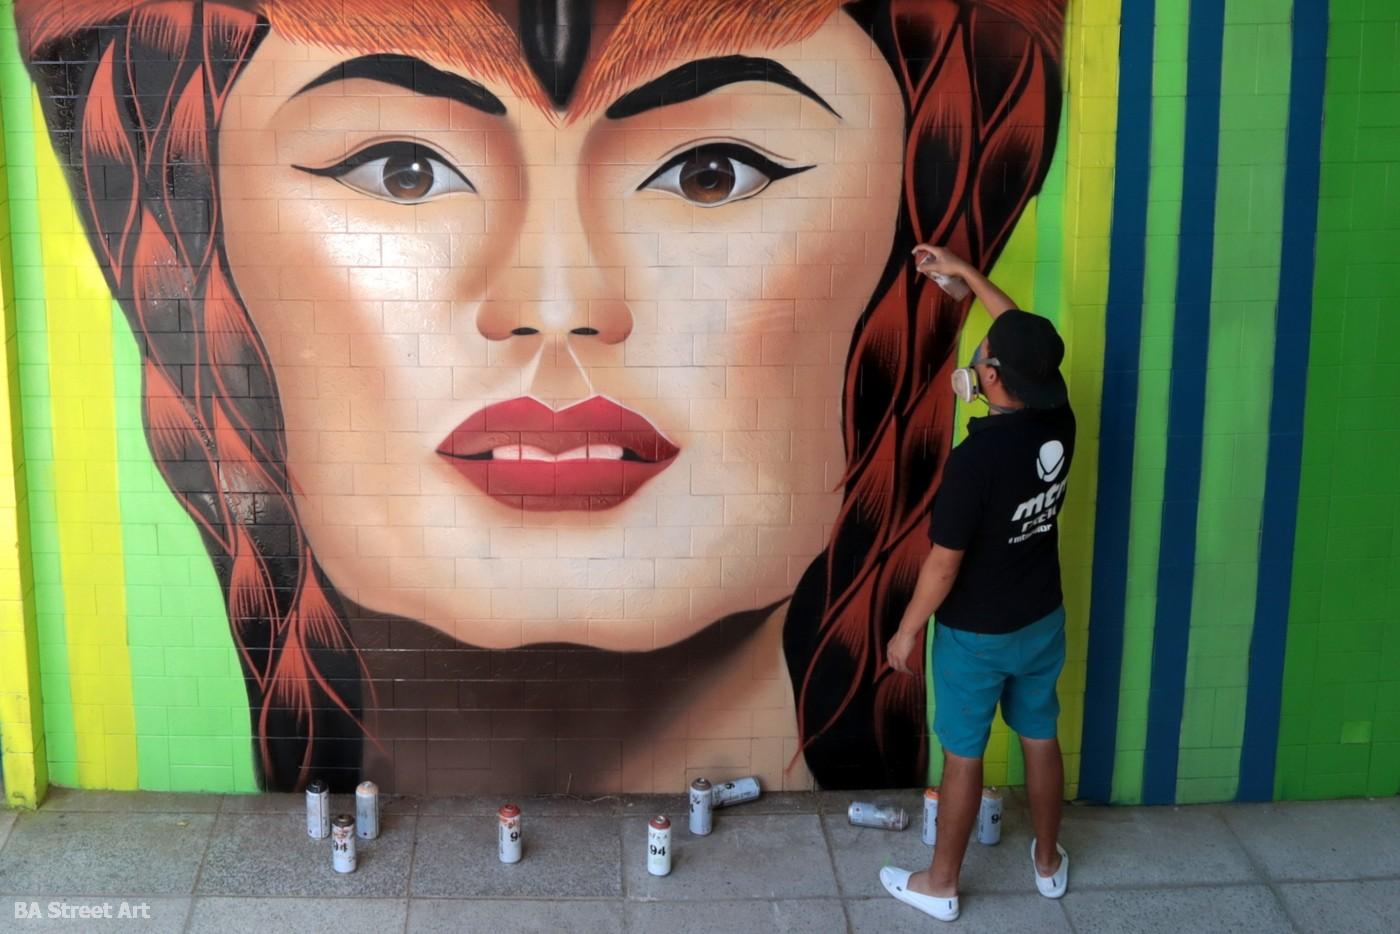 realismo muralista hech uno graffiti mujer retrato buenos aires argentina BA Street Art proyecto de mural